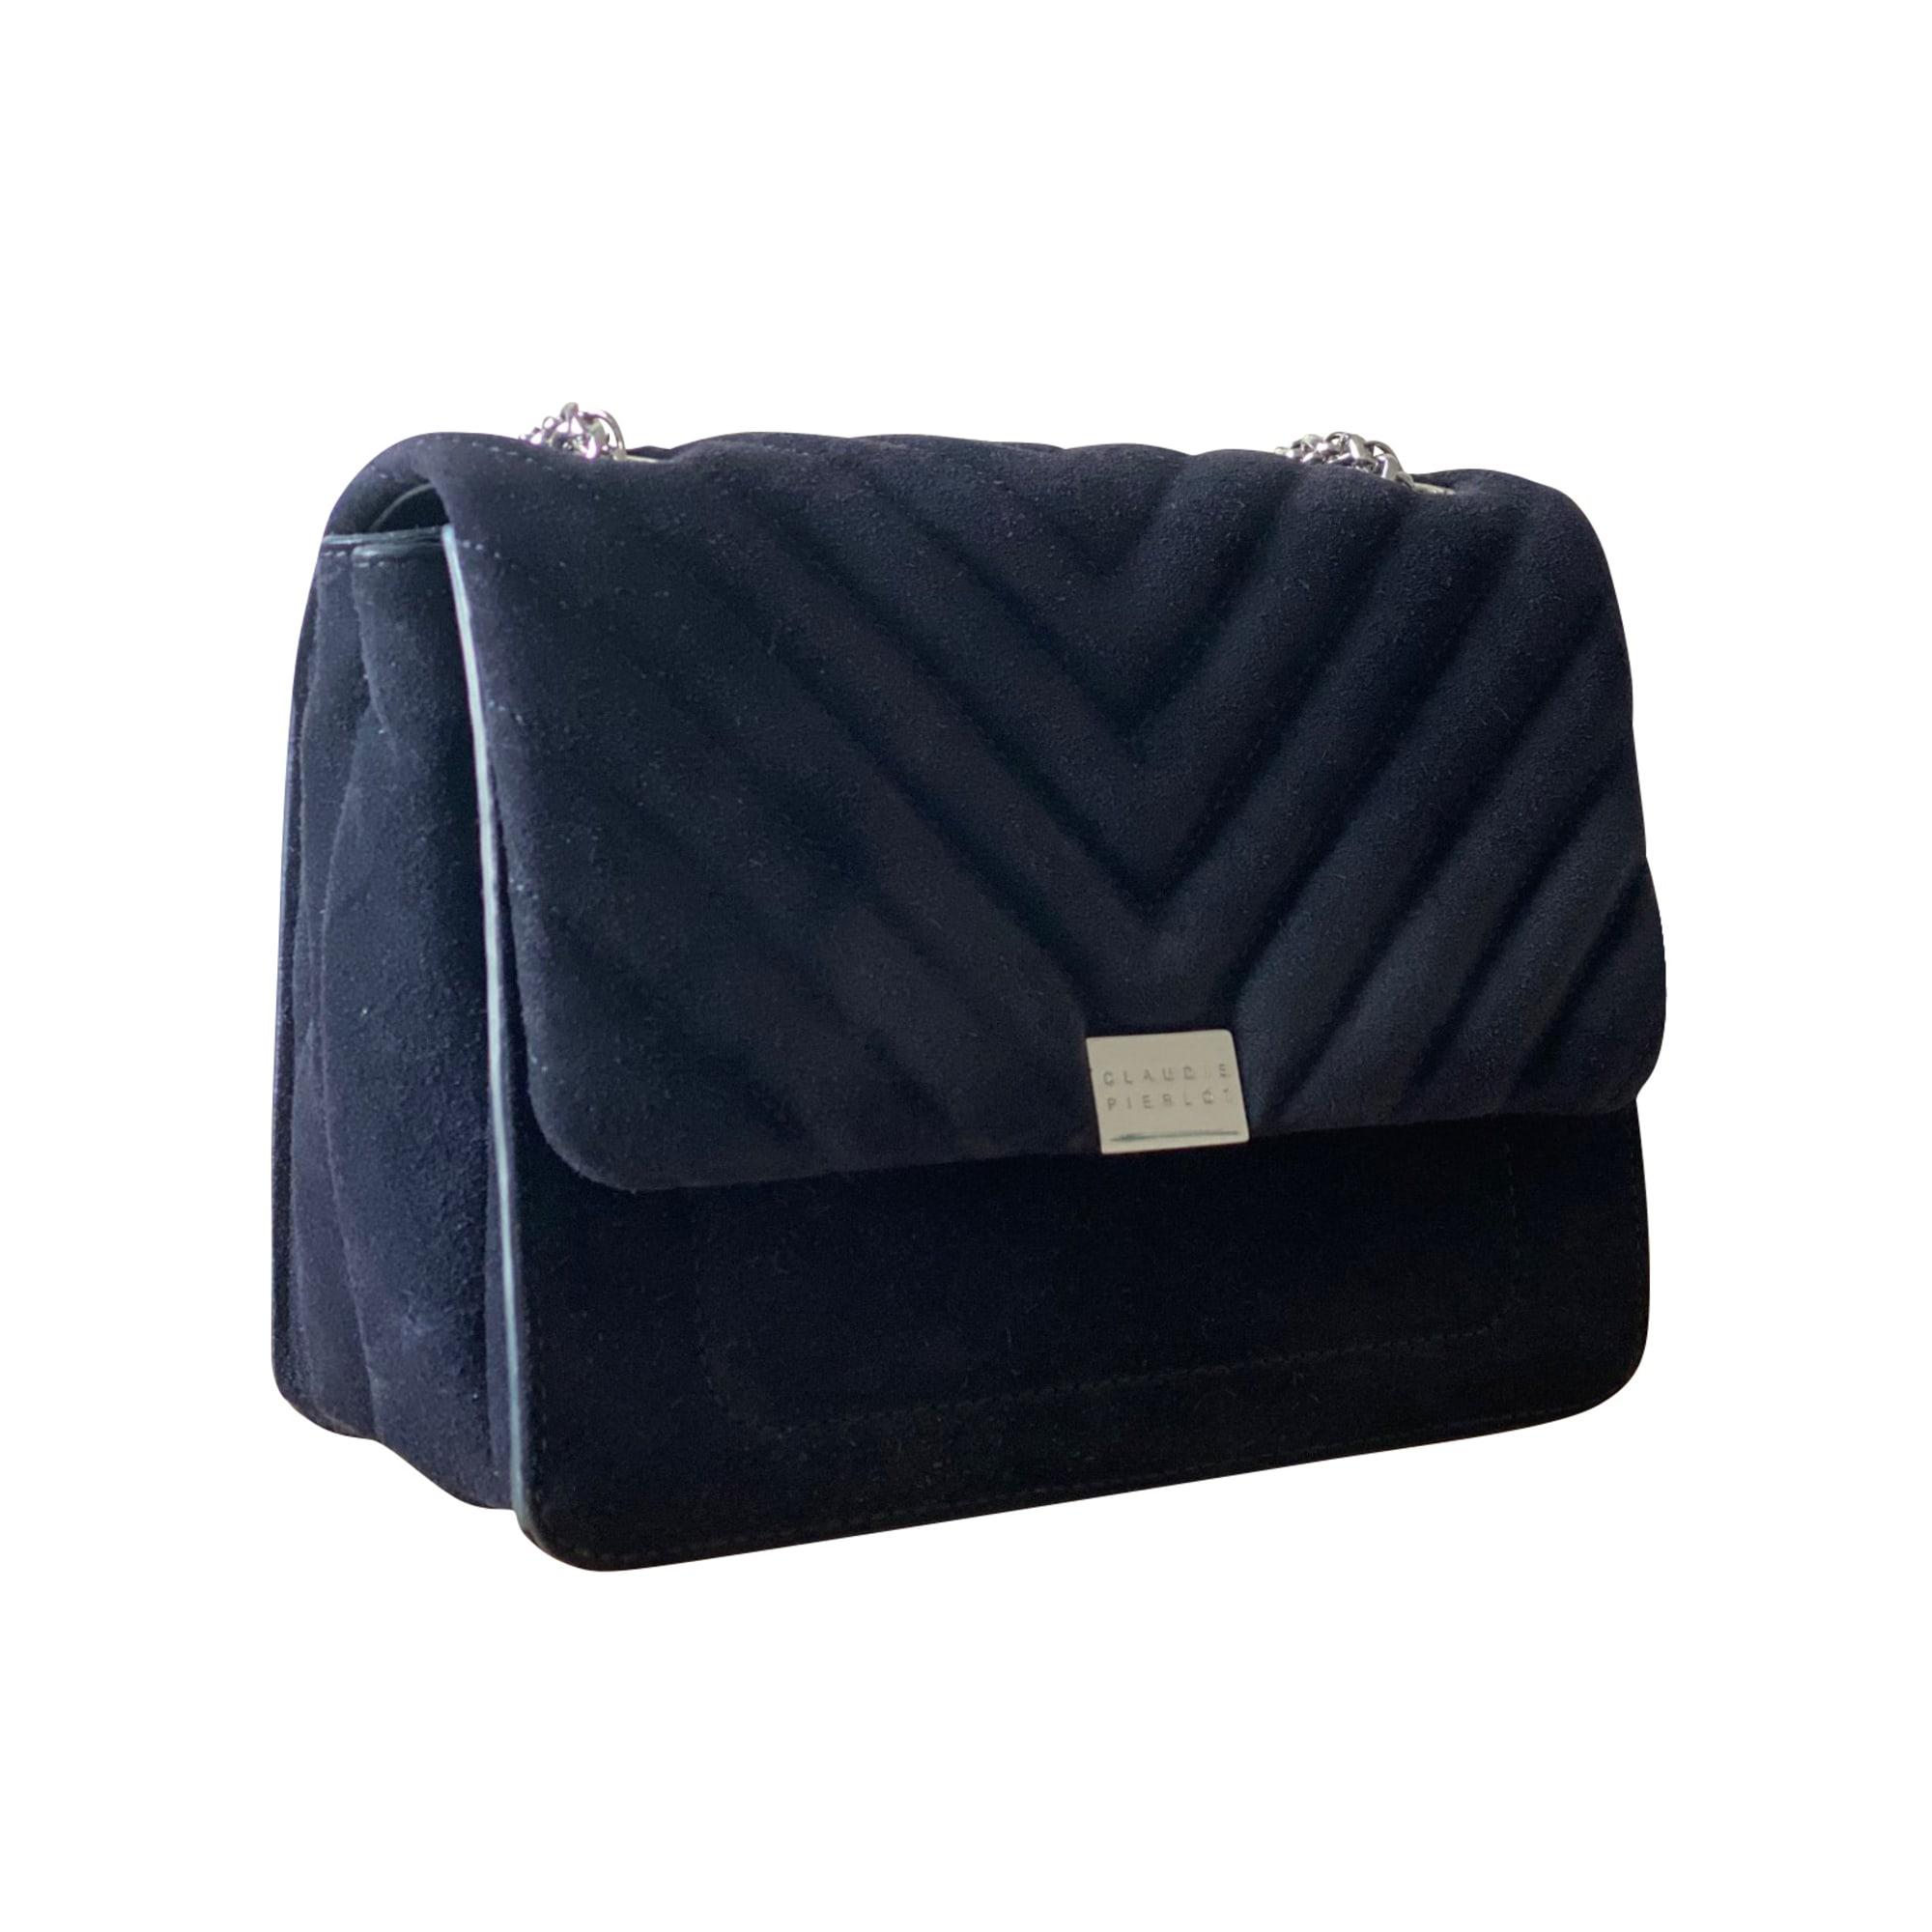 Leather Handbag CLAUDIE PIERLOT Blue, navy, turquoise